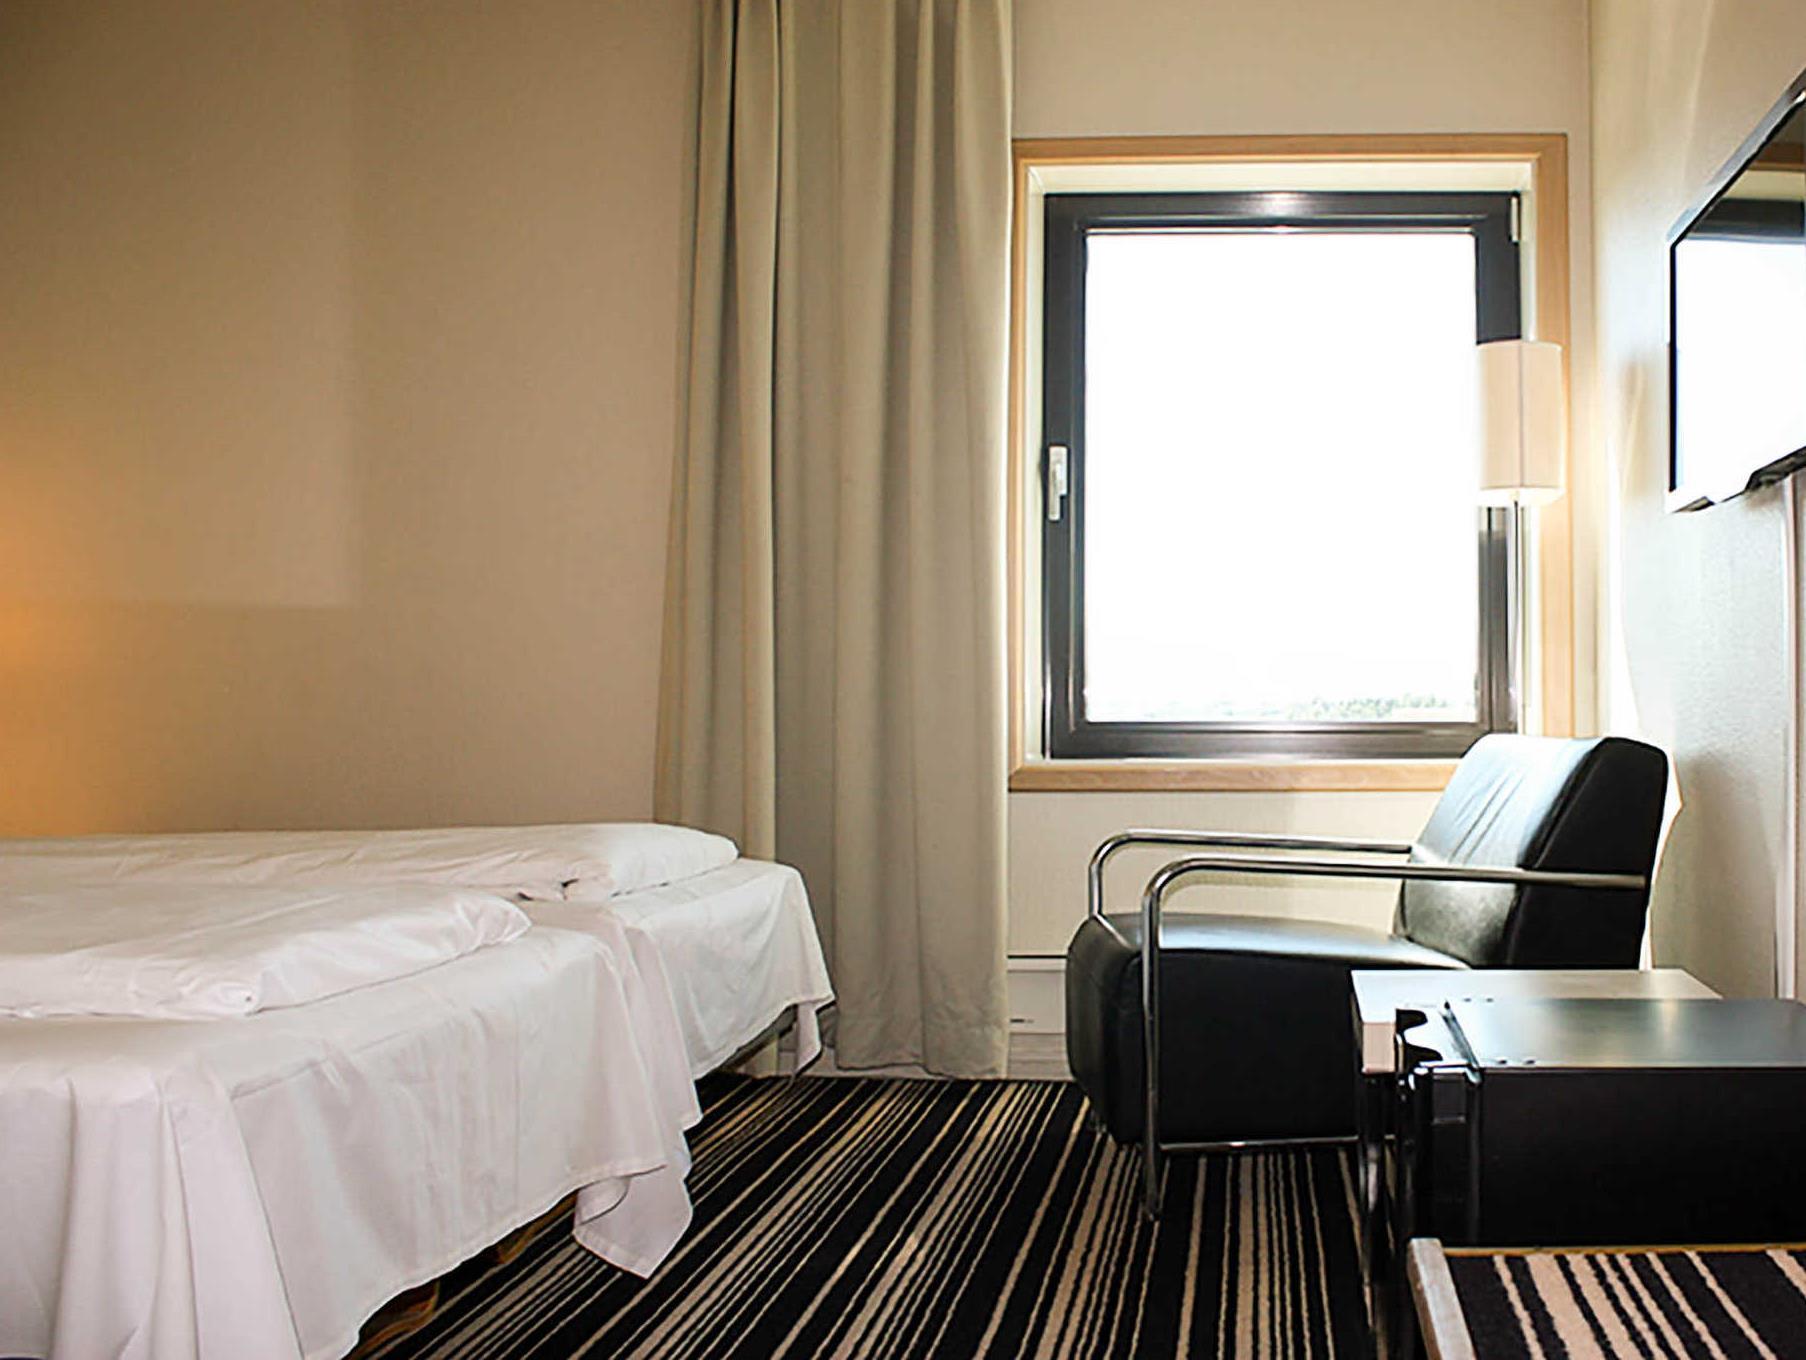 Quality Hotel Panorama Tiller, Trondheim